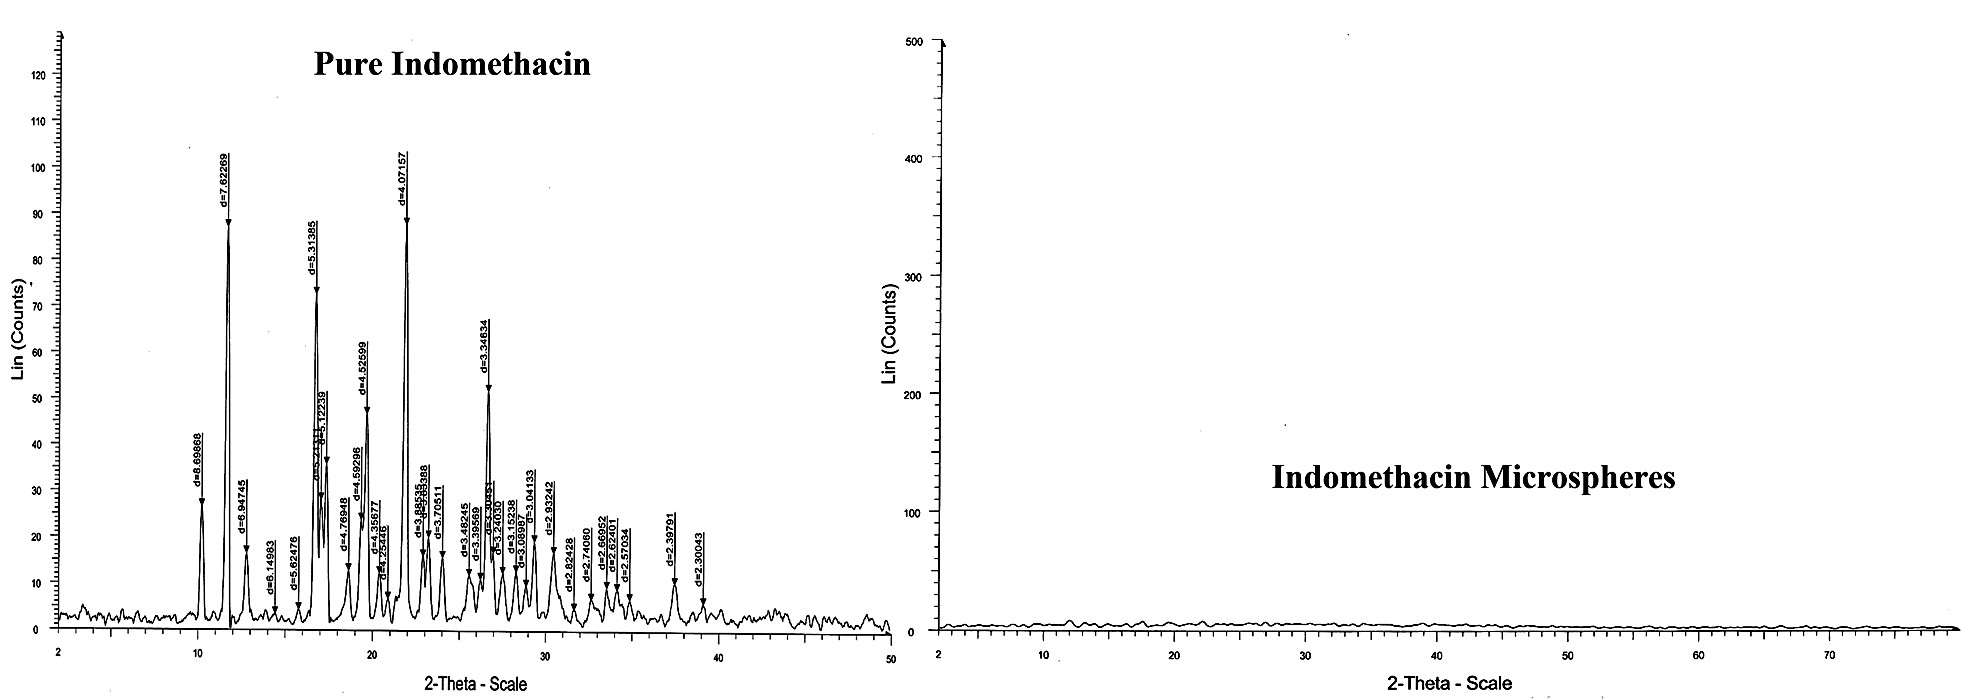 Fig. 3. XRD spectra of pure indomethacin and indomethacin microspheres